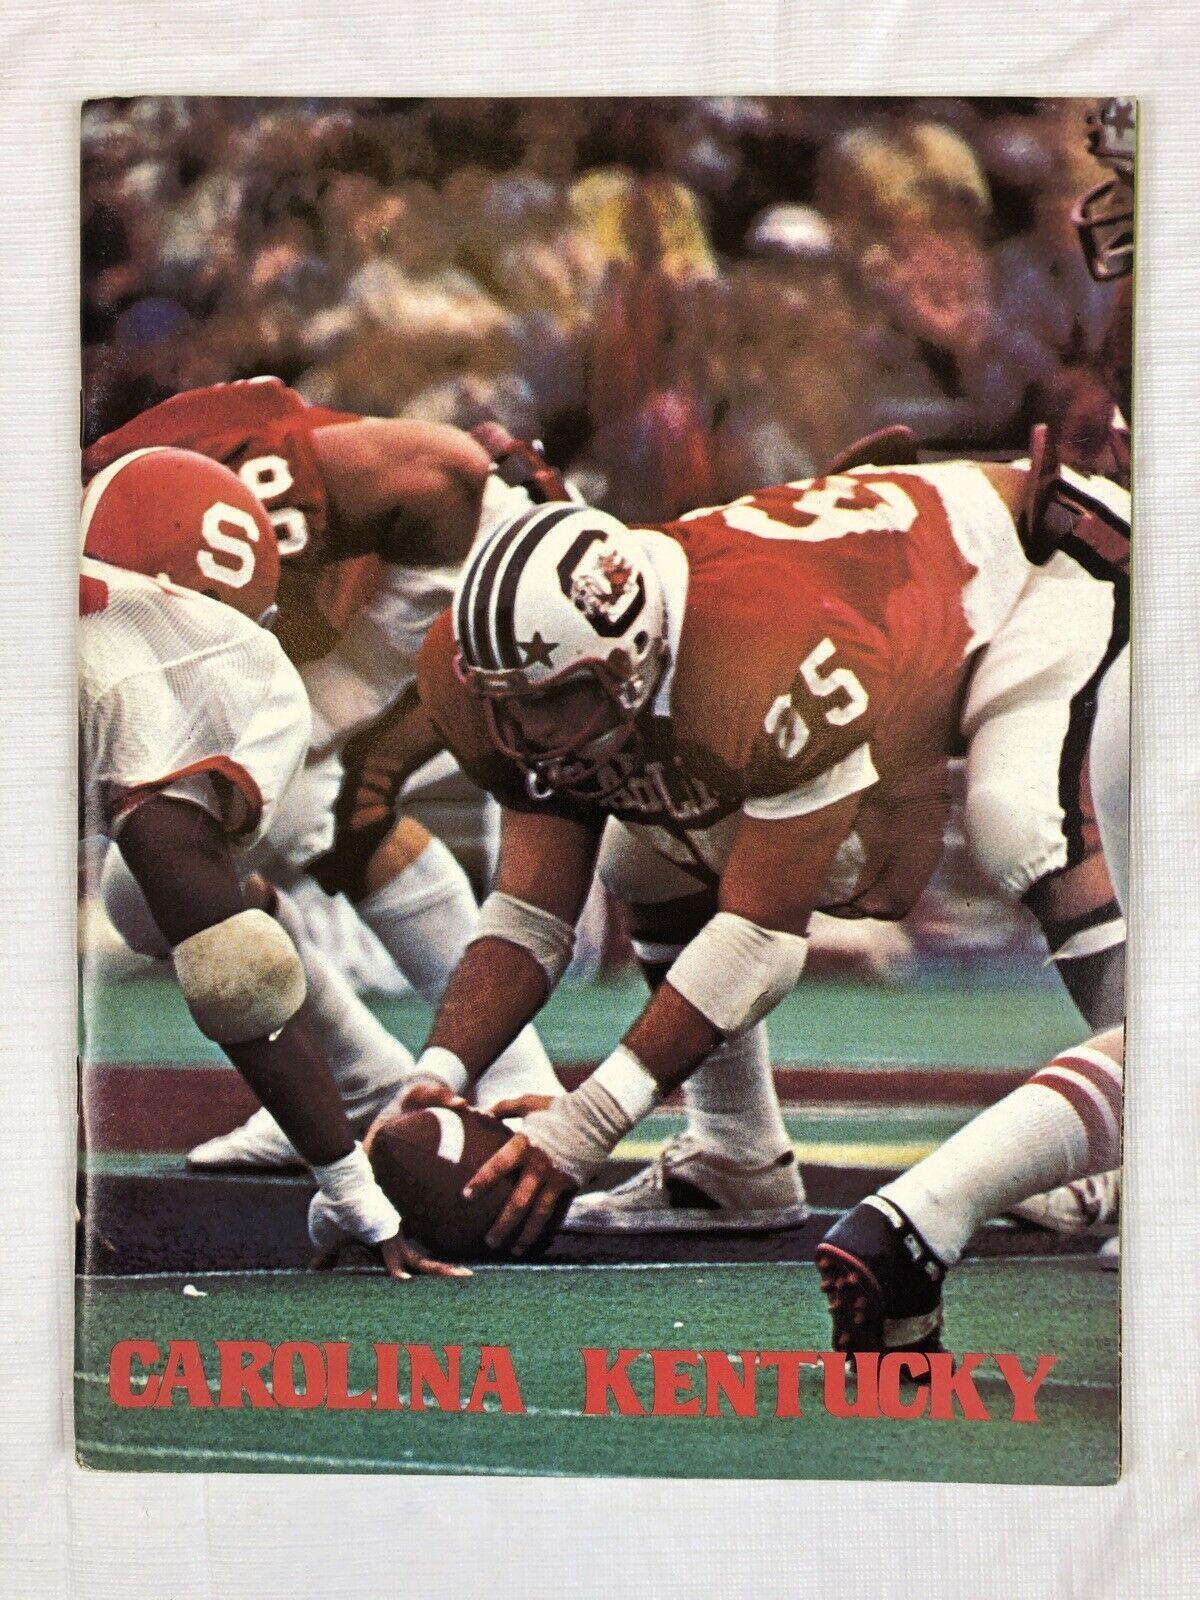 1978 south carolina vs kentucky ncaa official football